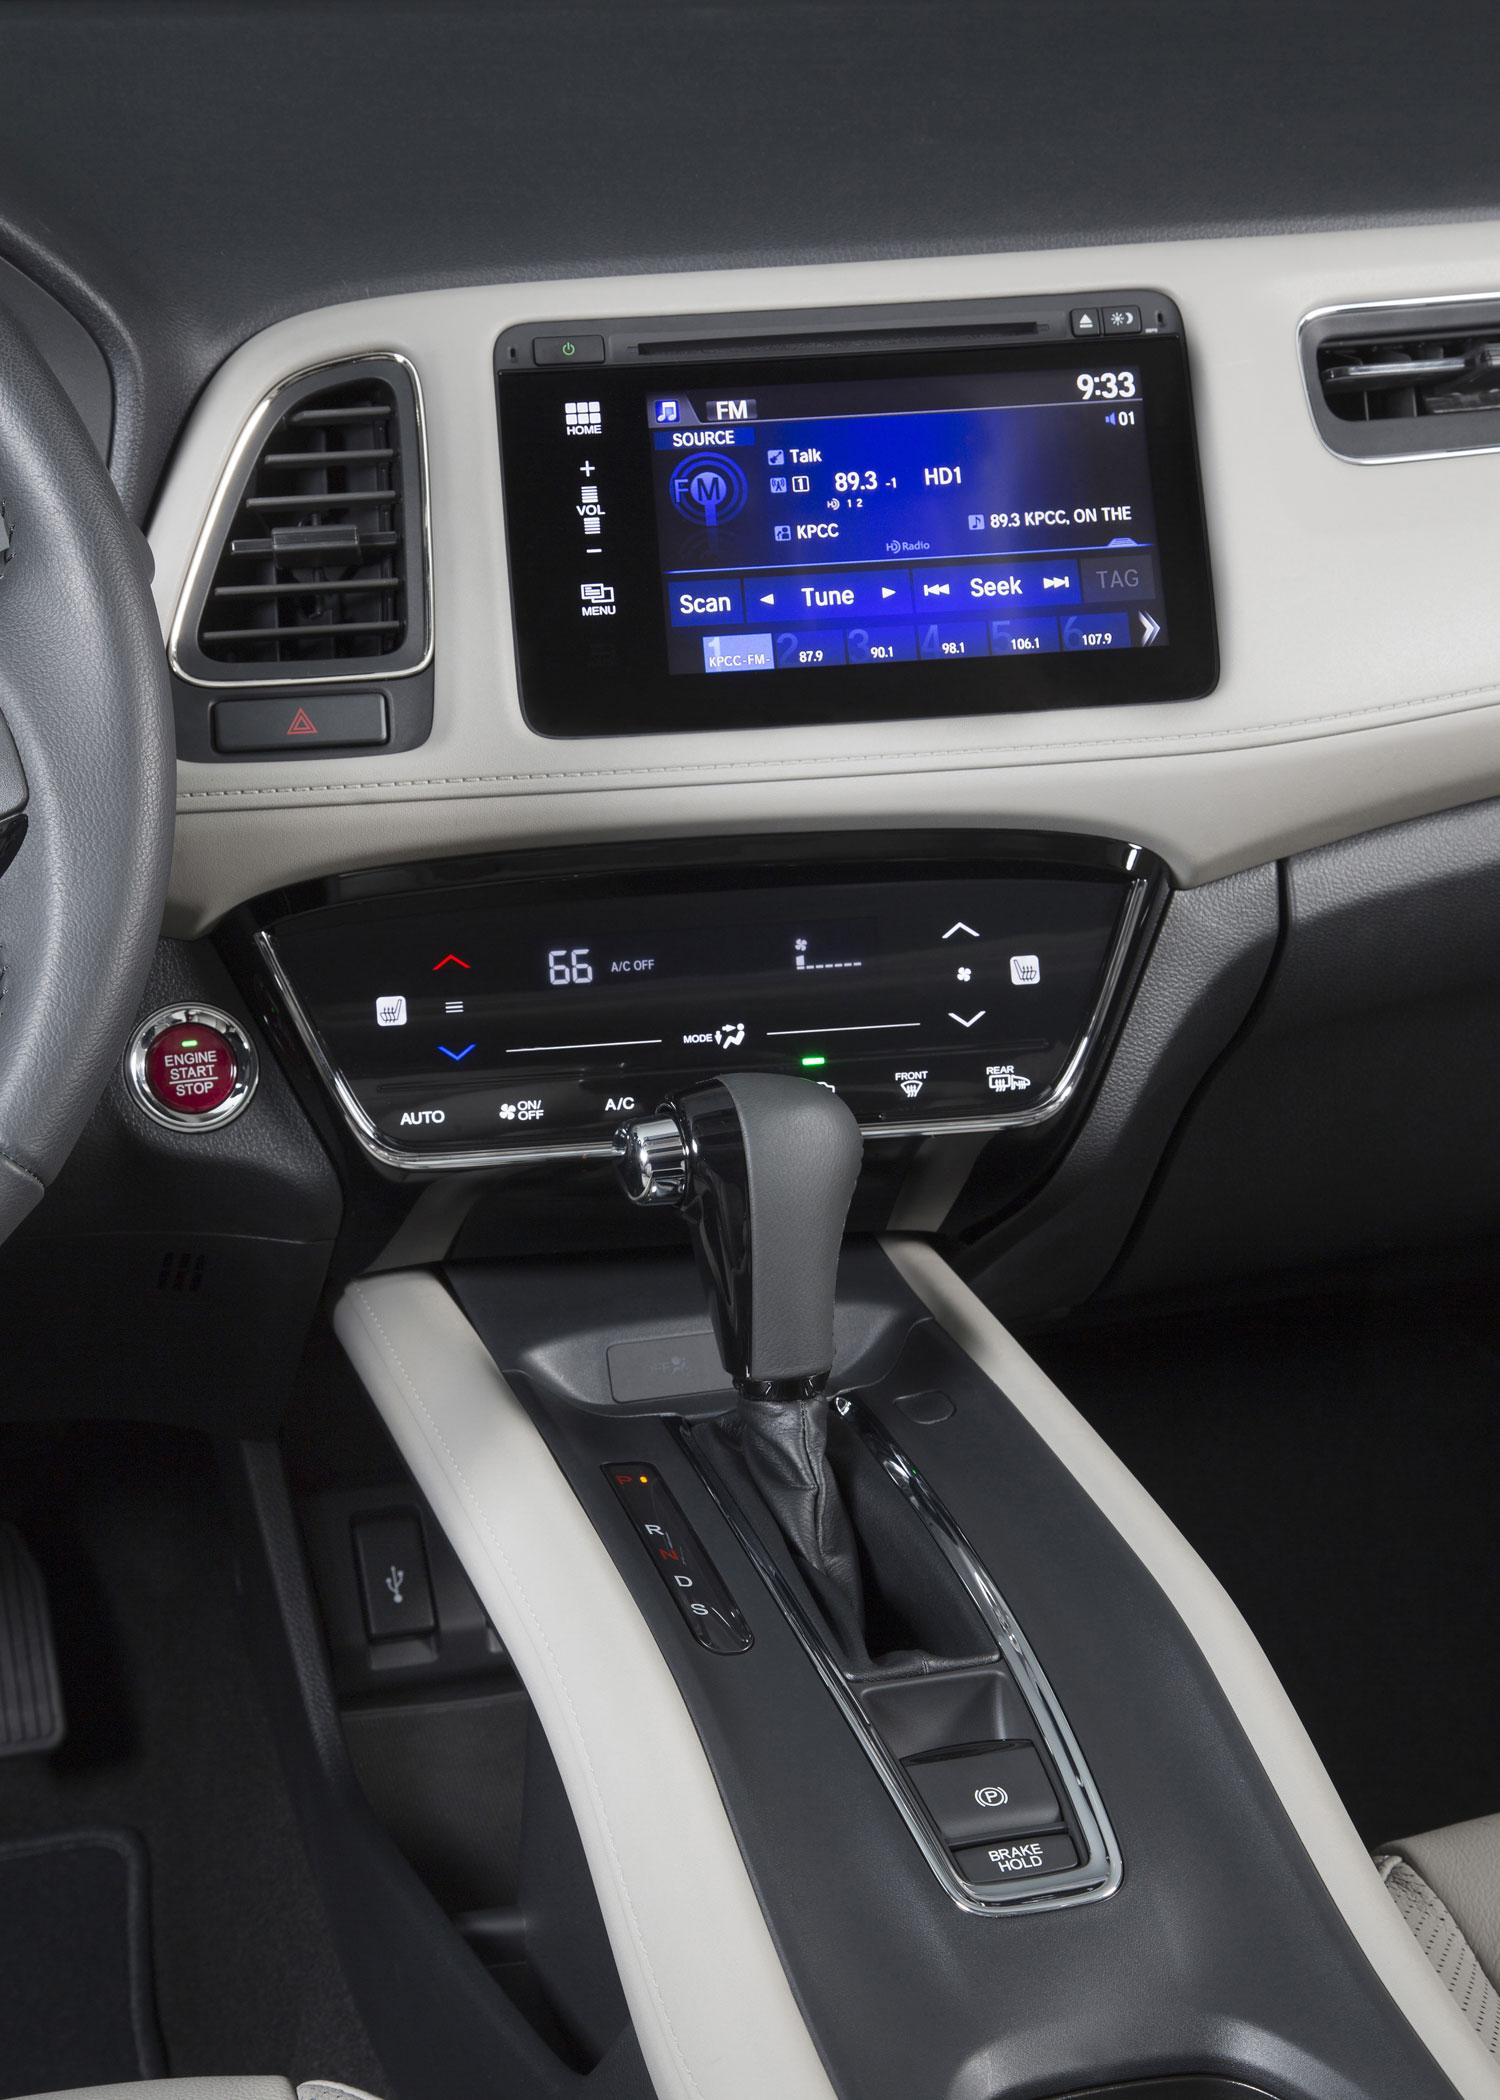 2016 Honda HR V Center Stack And Shifter